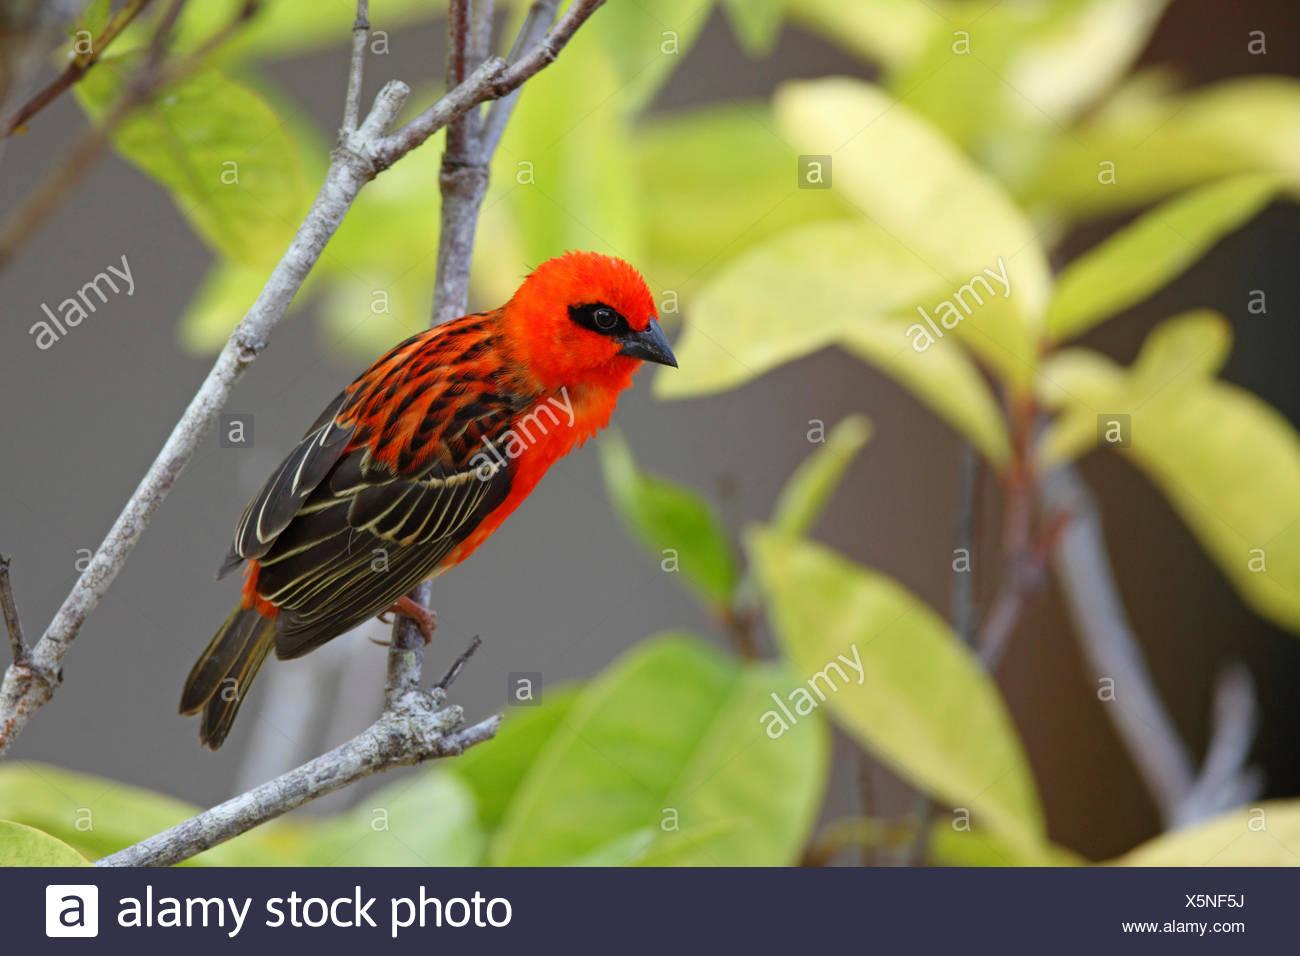 Madagascan red fody (Foudia madagascariensis), male sitting in a shrub, Seychelles, Praslin - Stock Image